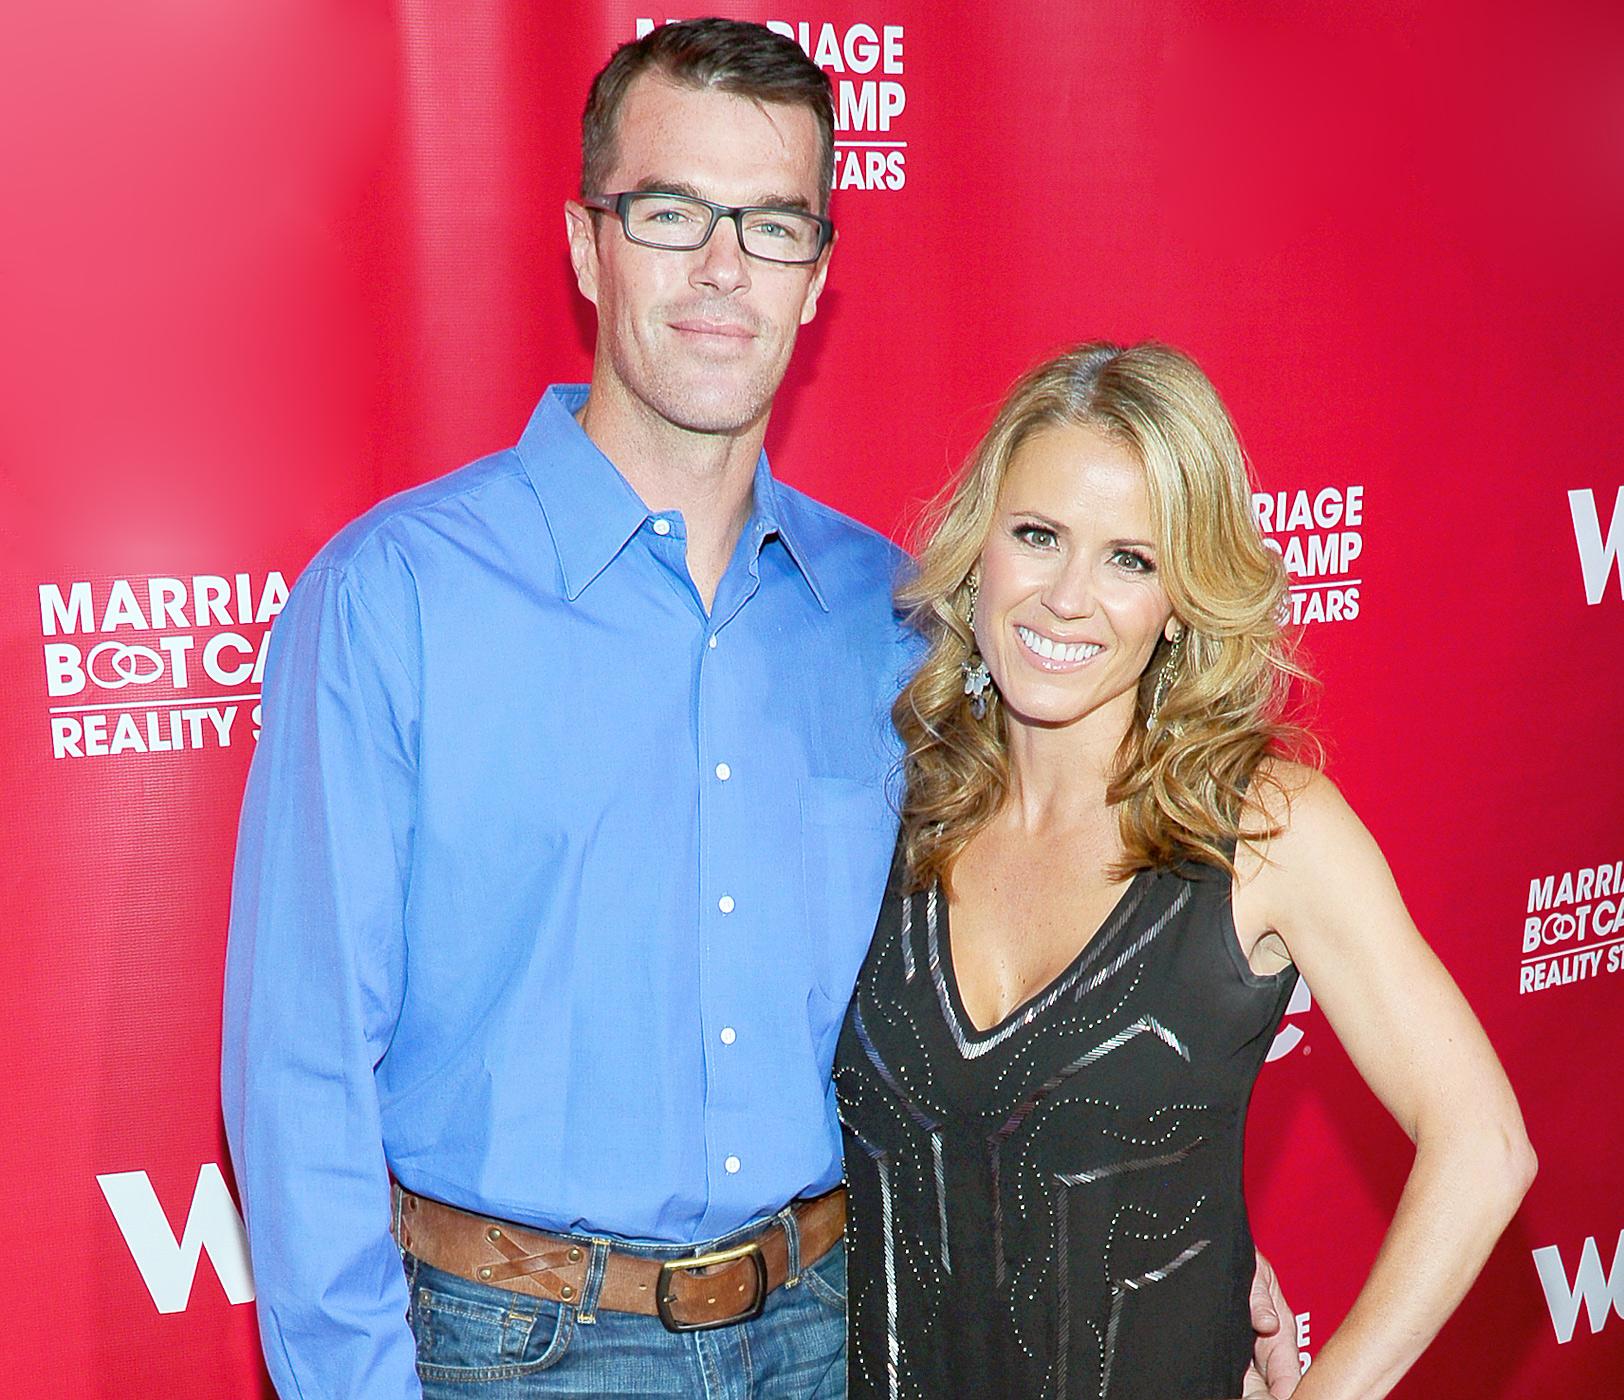 Ryan Sutter and Trista Sutter